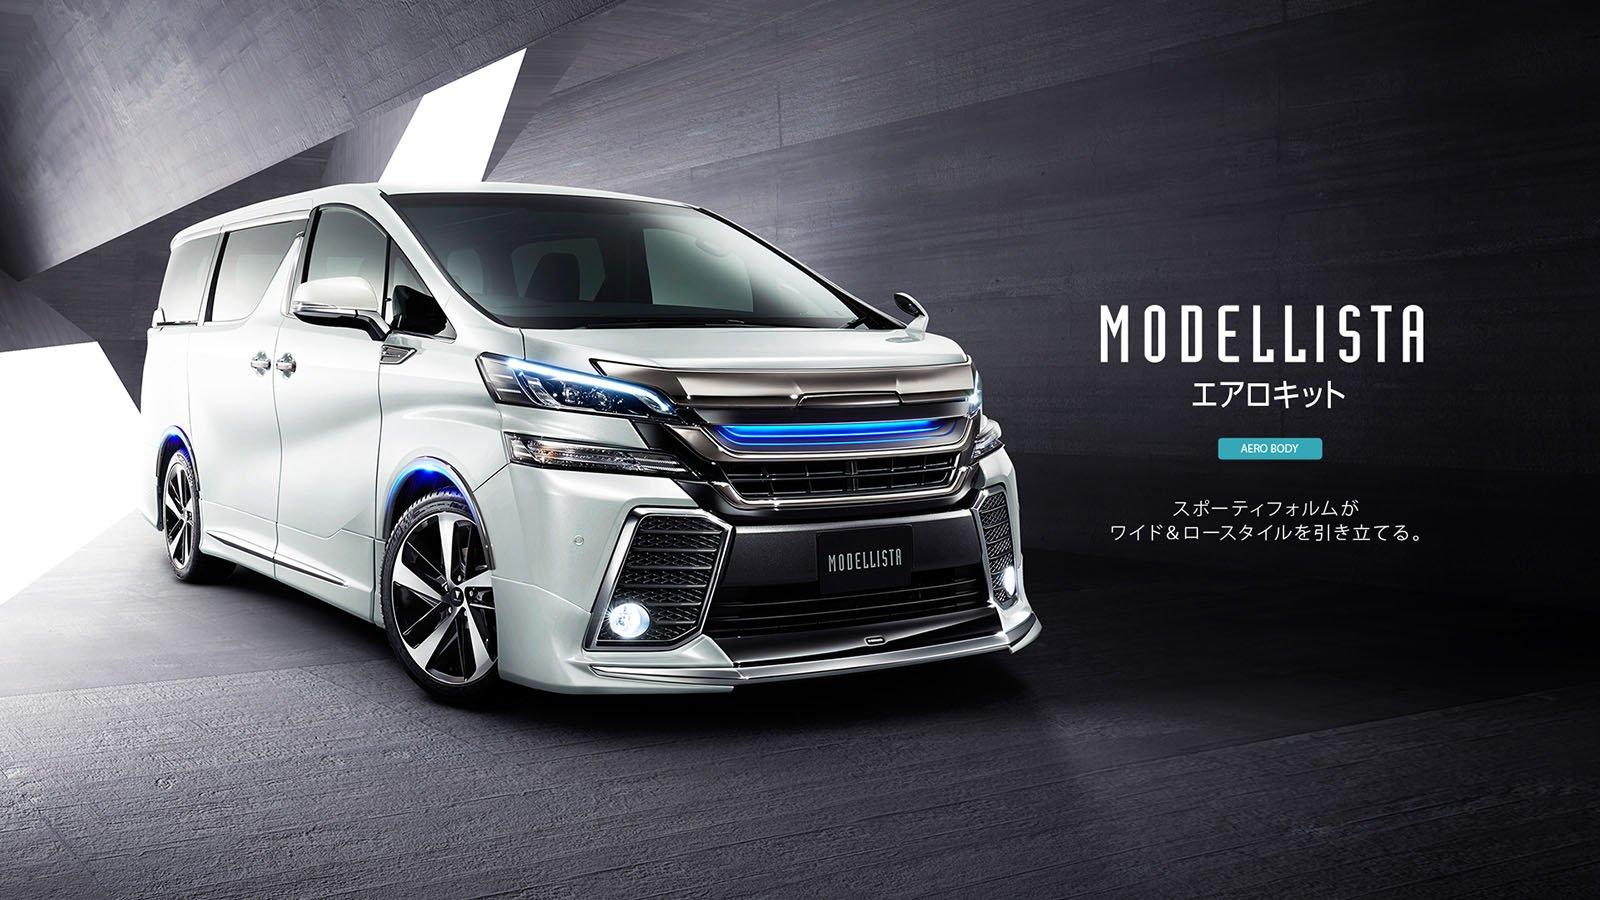 Back to Story: 2016 Toyota Alphard, Vellfire get Modellista body kits